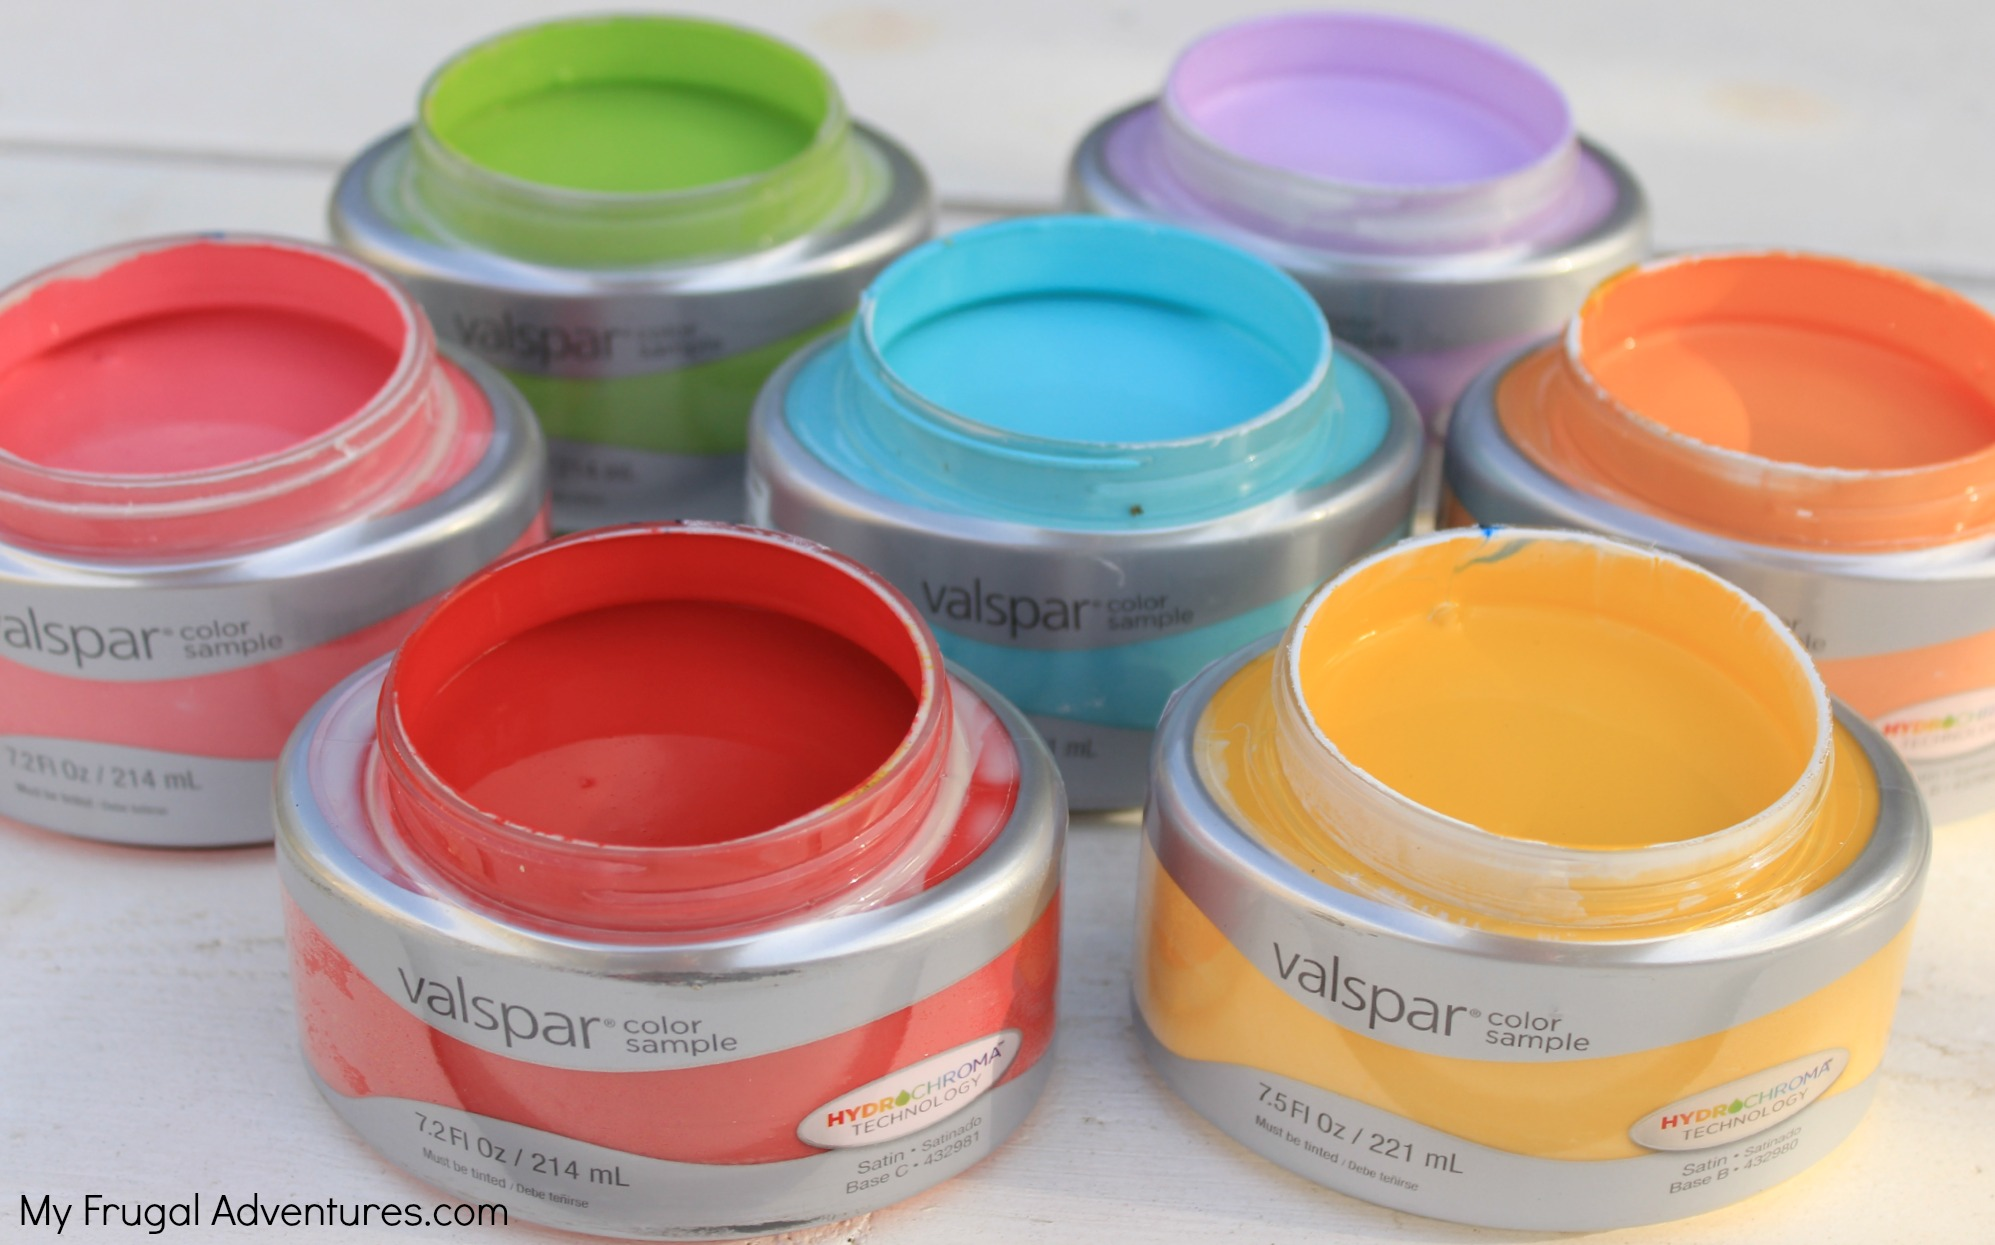 Lowe's: $.99 Valspar Paint Samples - My Frugal Adventures